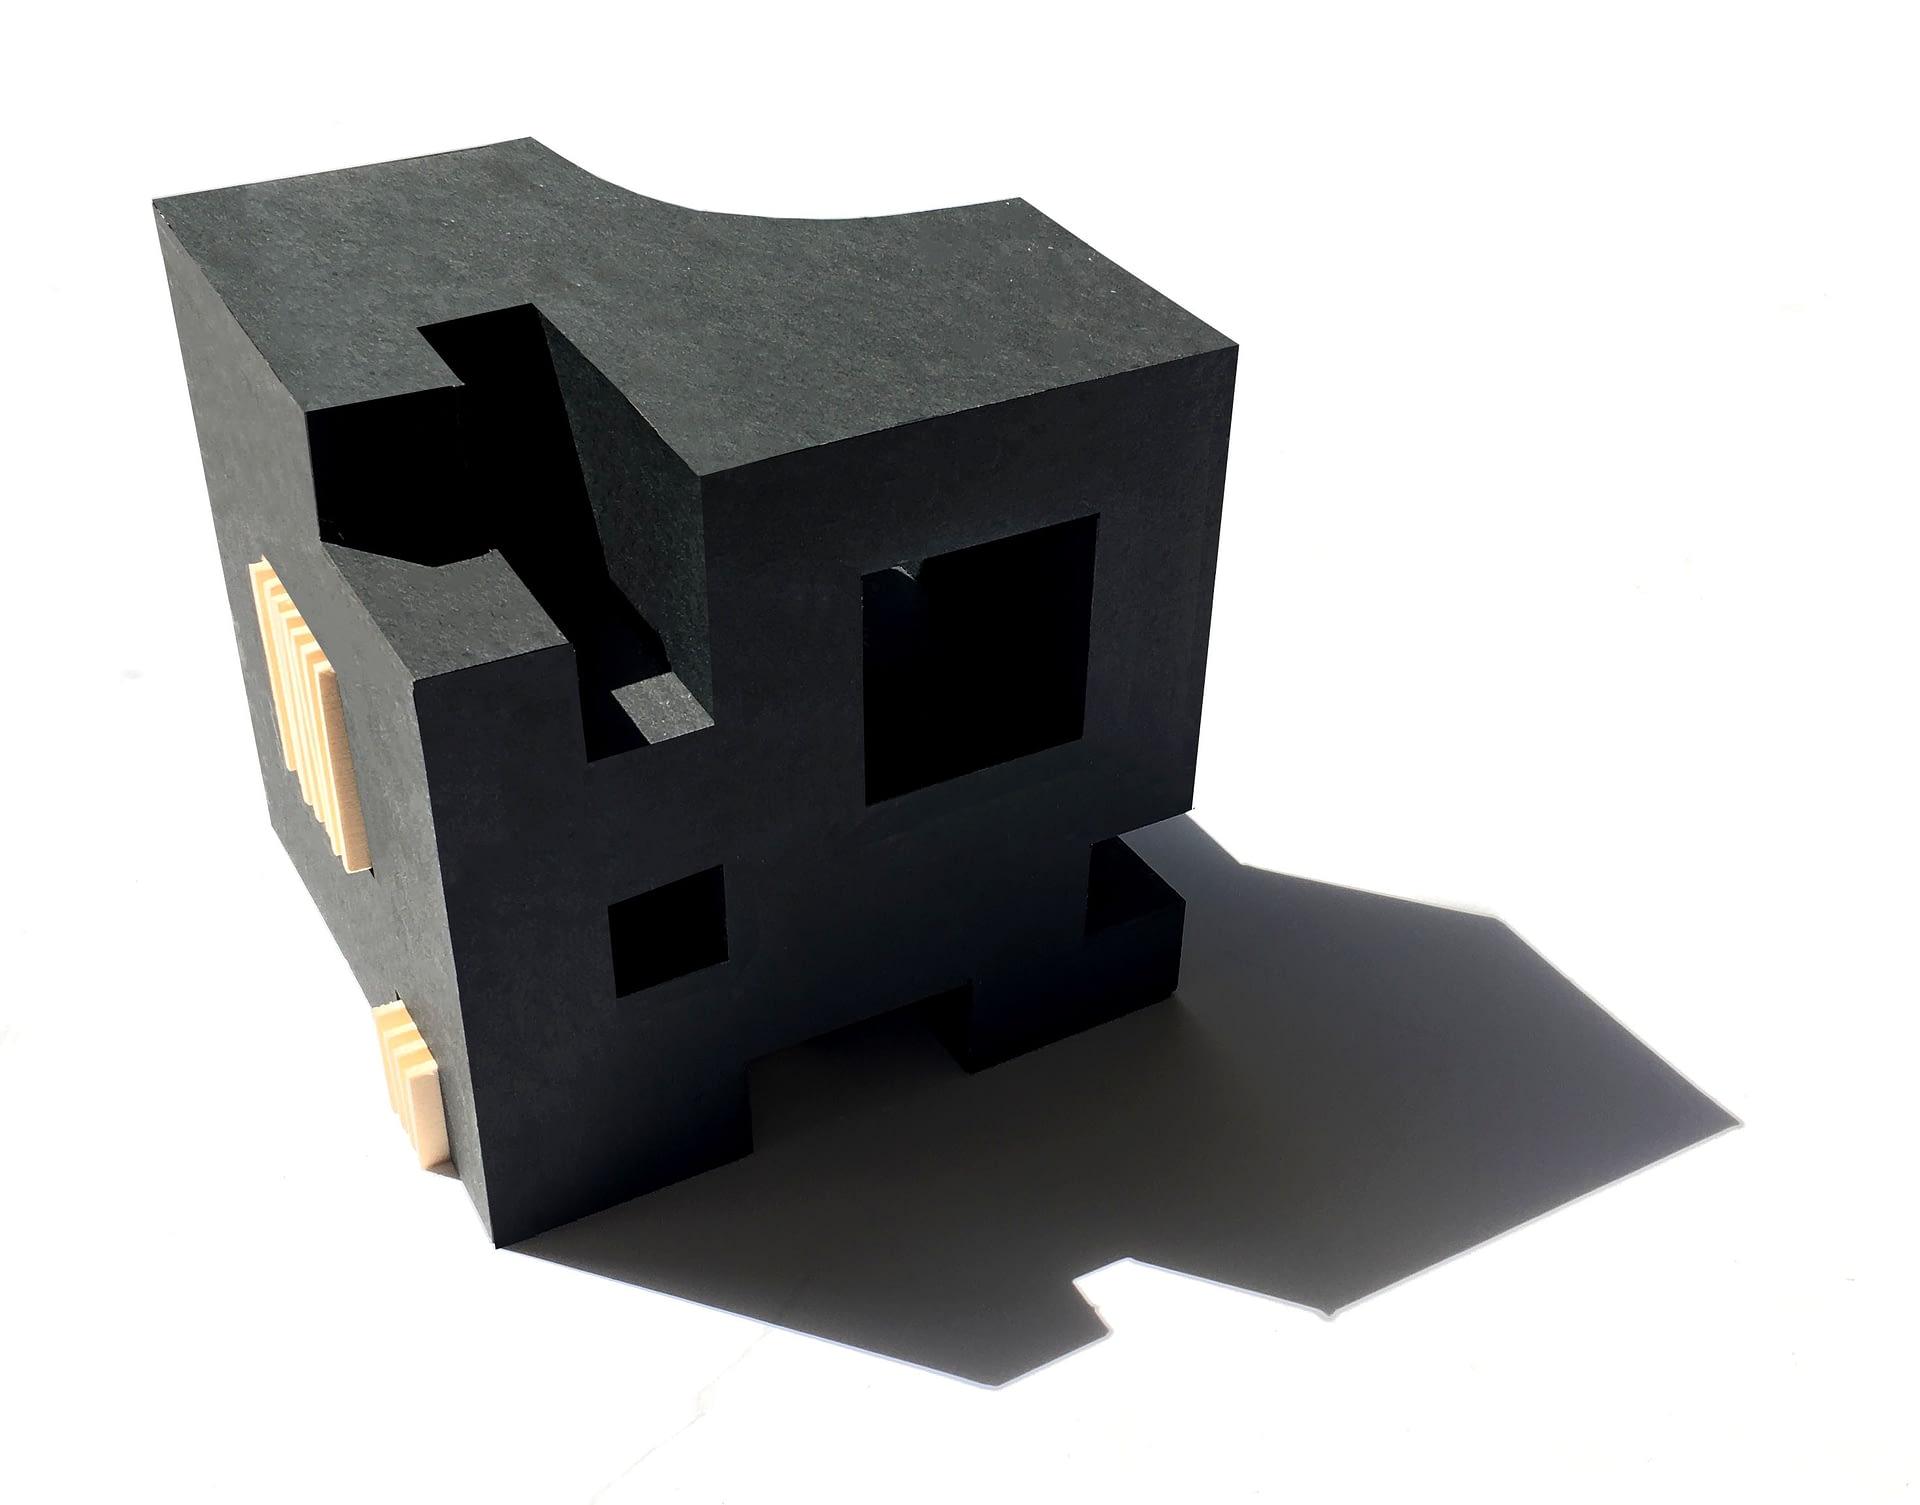 Digital Cube Alterations